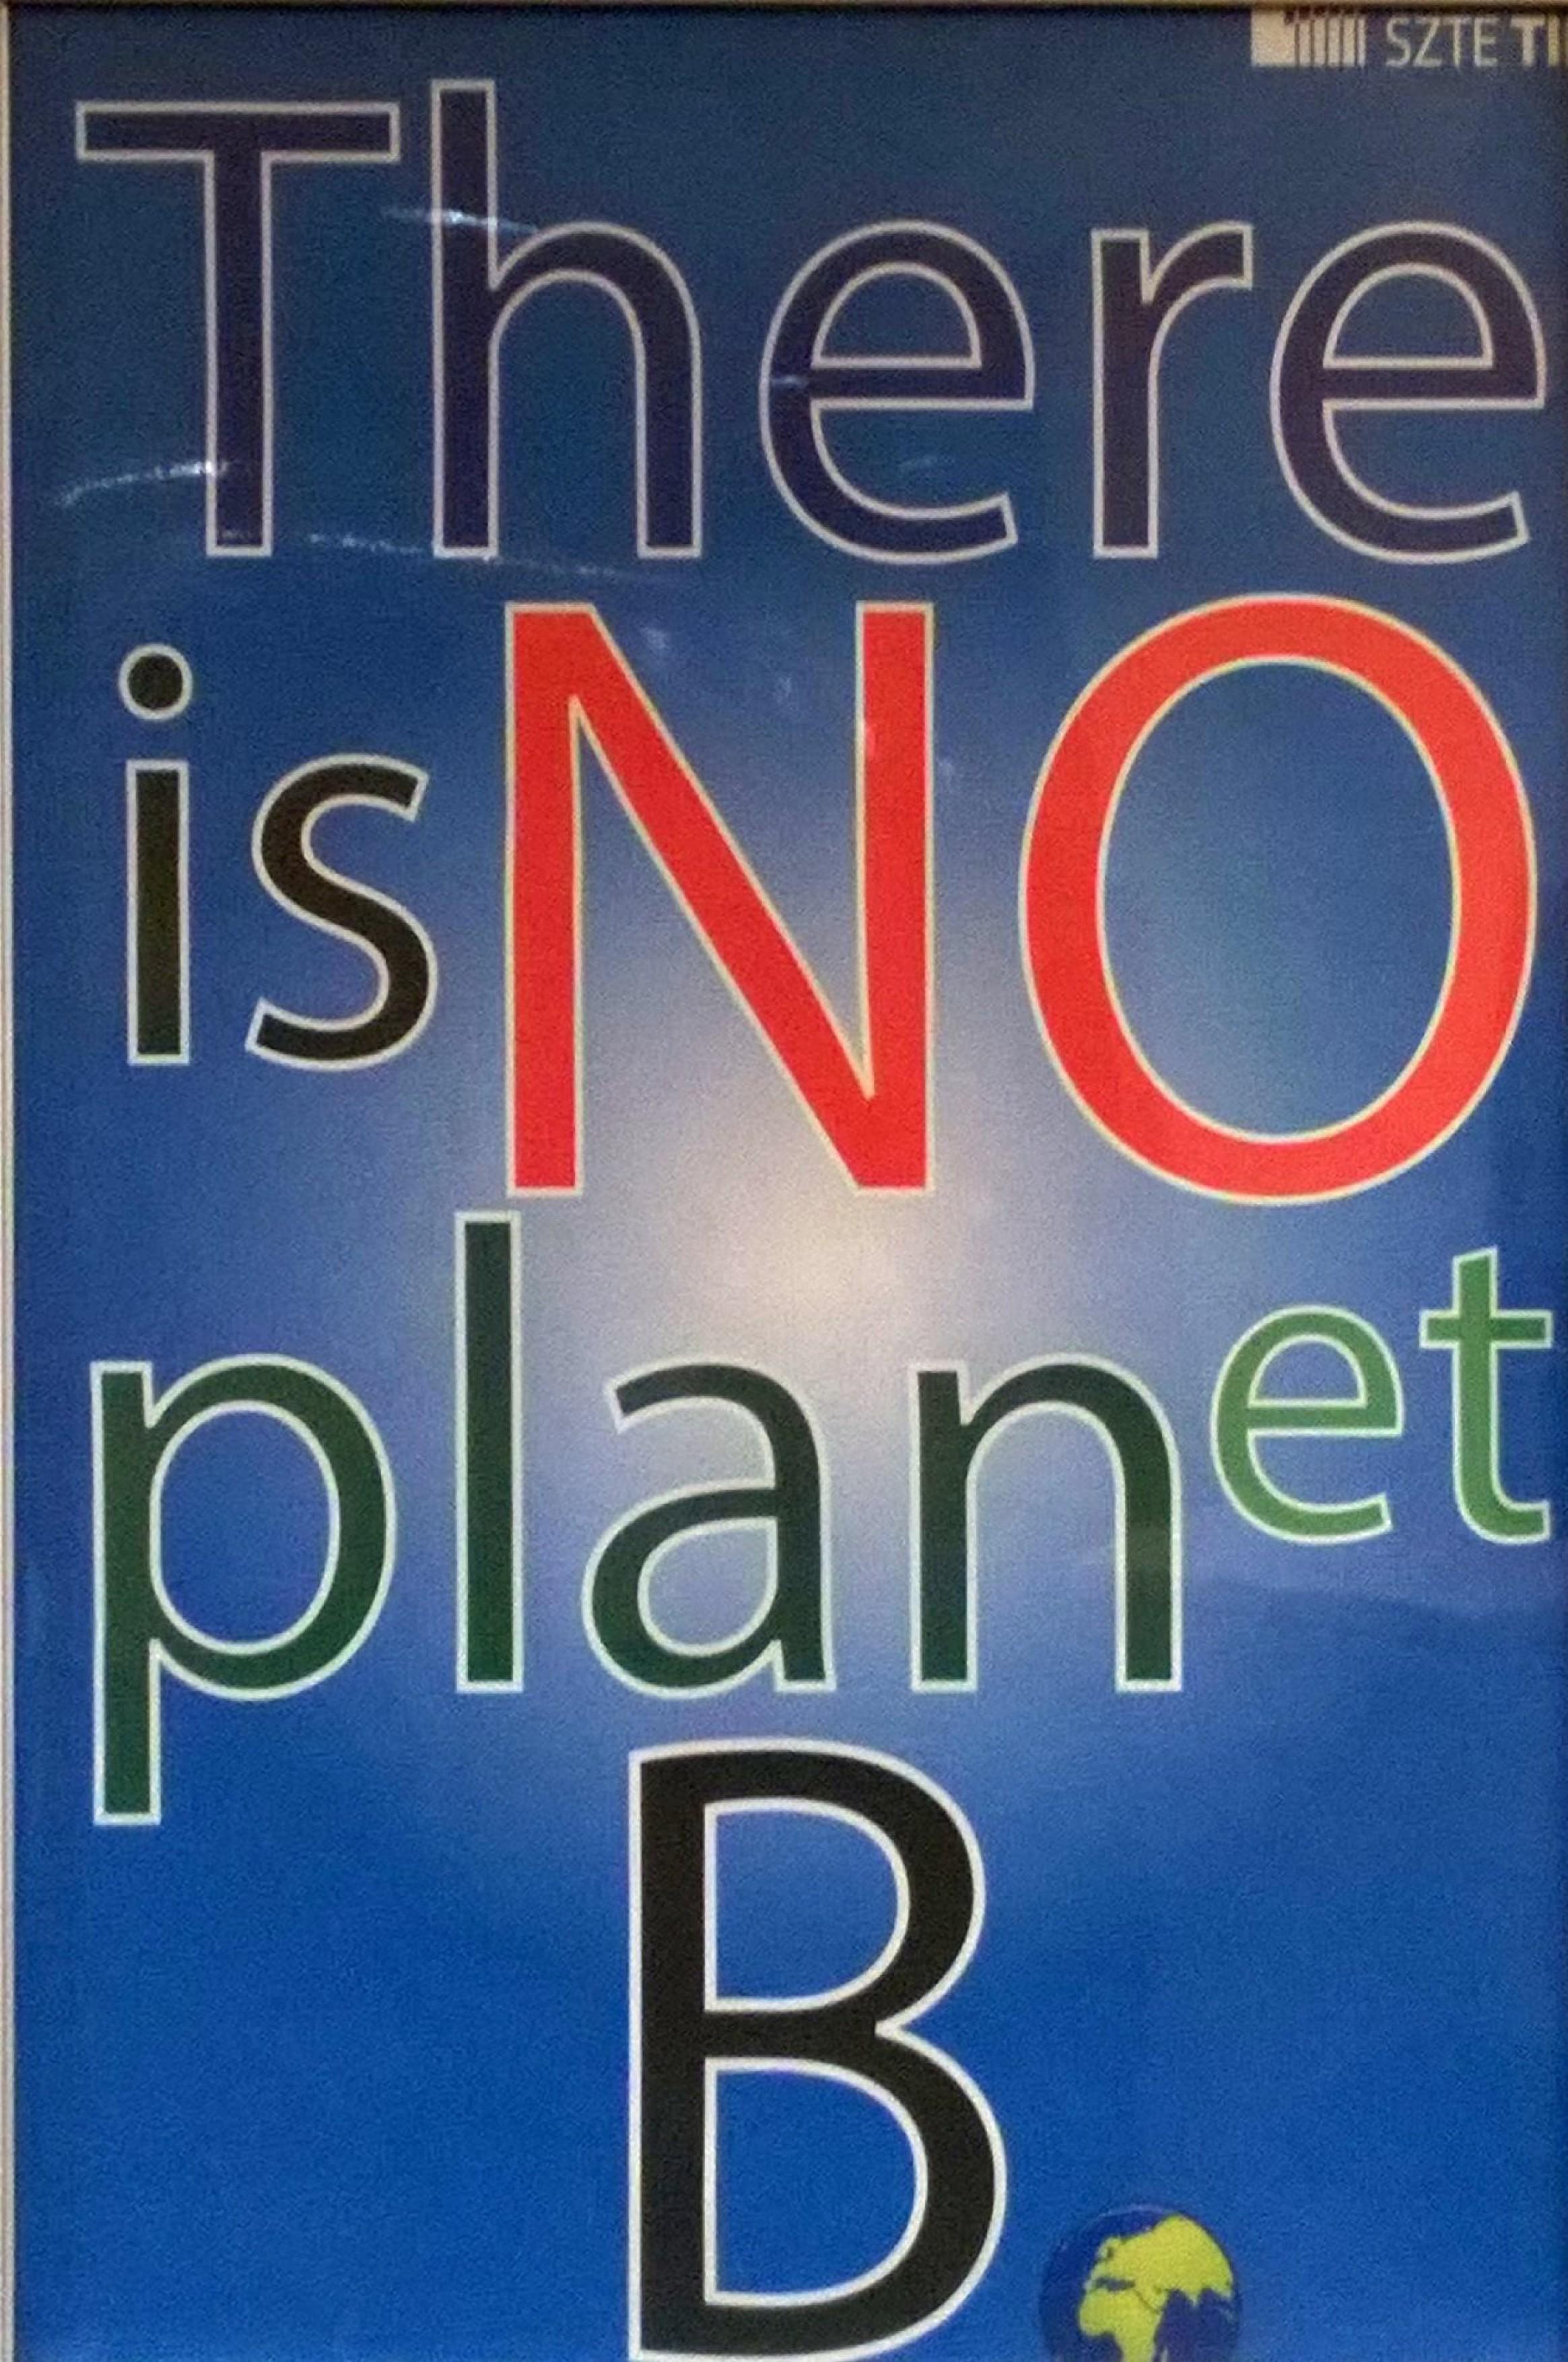 there_is_no_planet_b_szte_tik.jpg